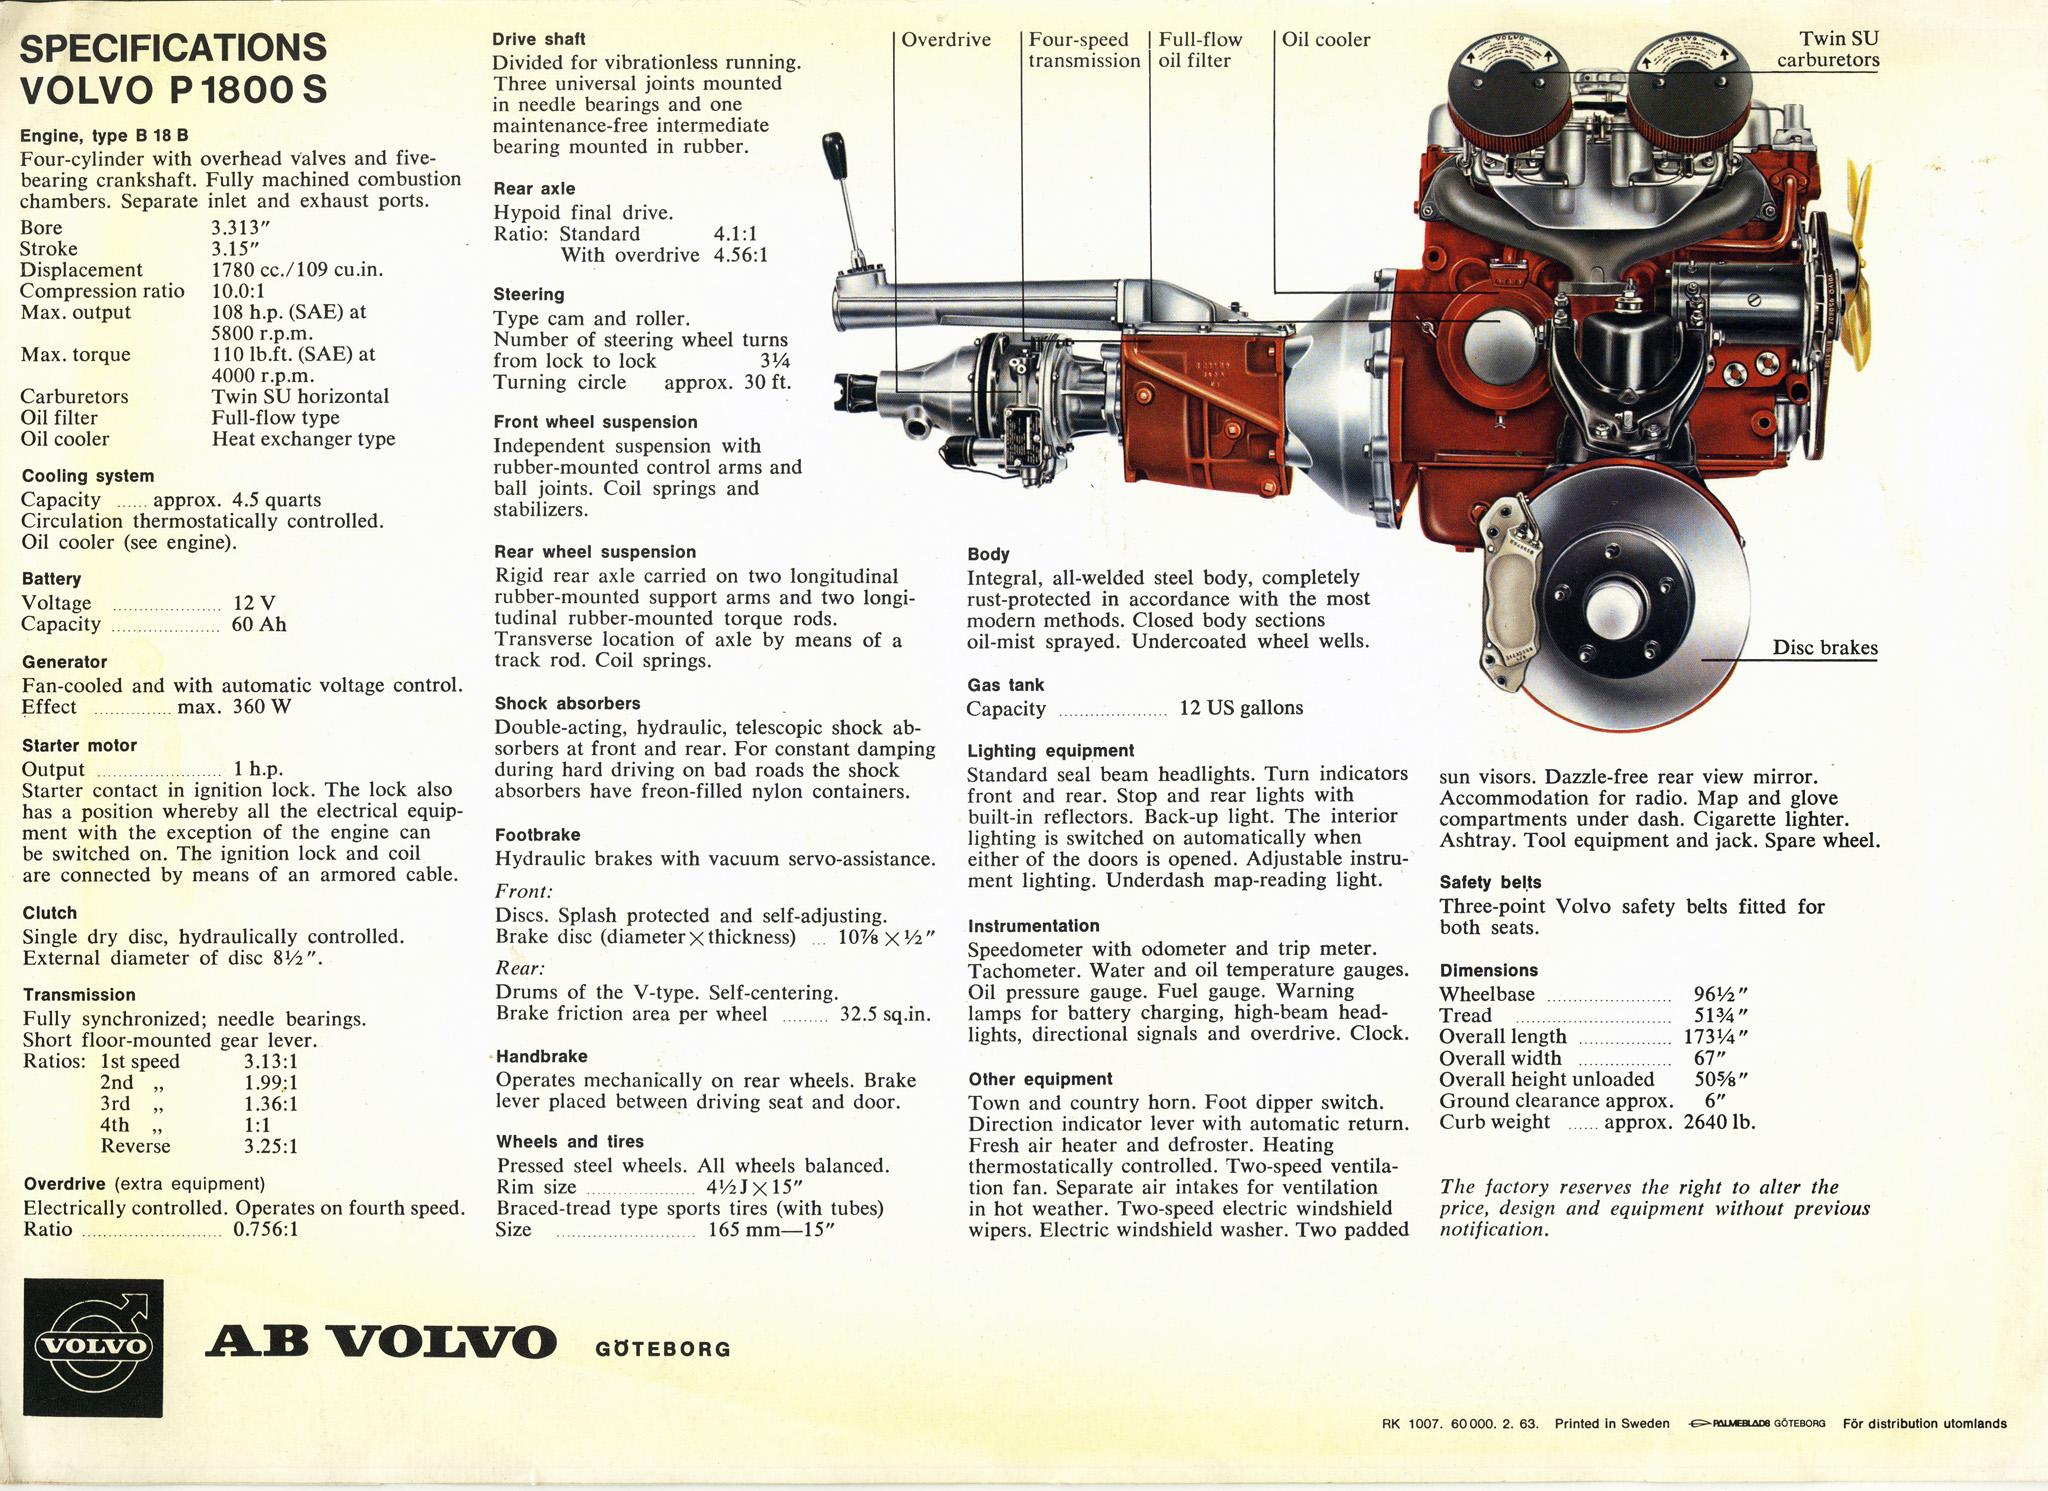 Volvo P1800S brochure, Feb 1963 - page 4